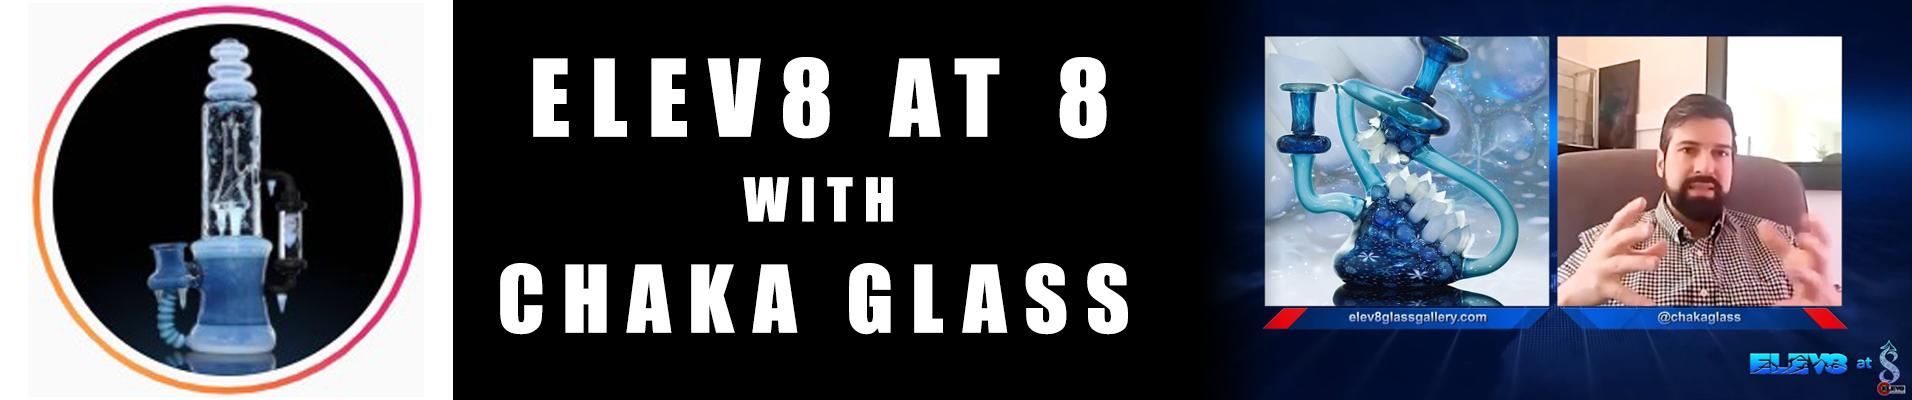 elev8-at-8-chaka-glass-banner.jpg